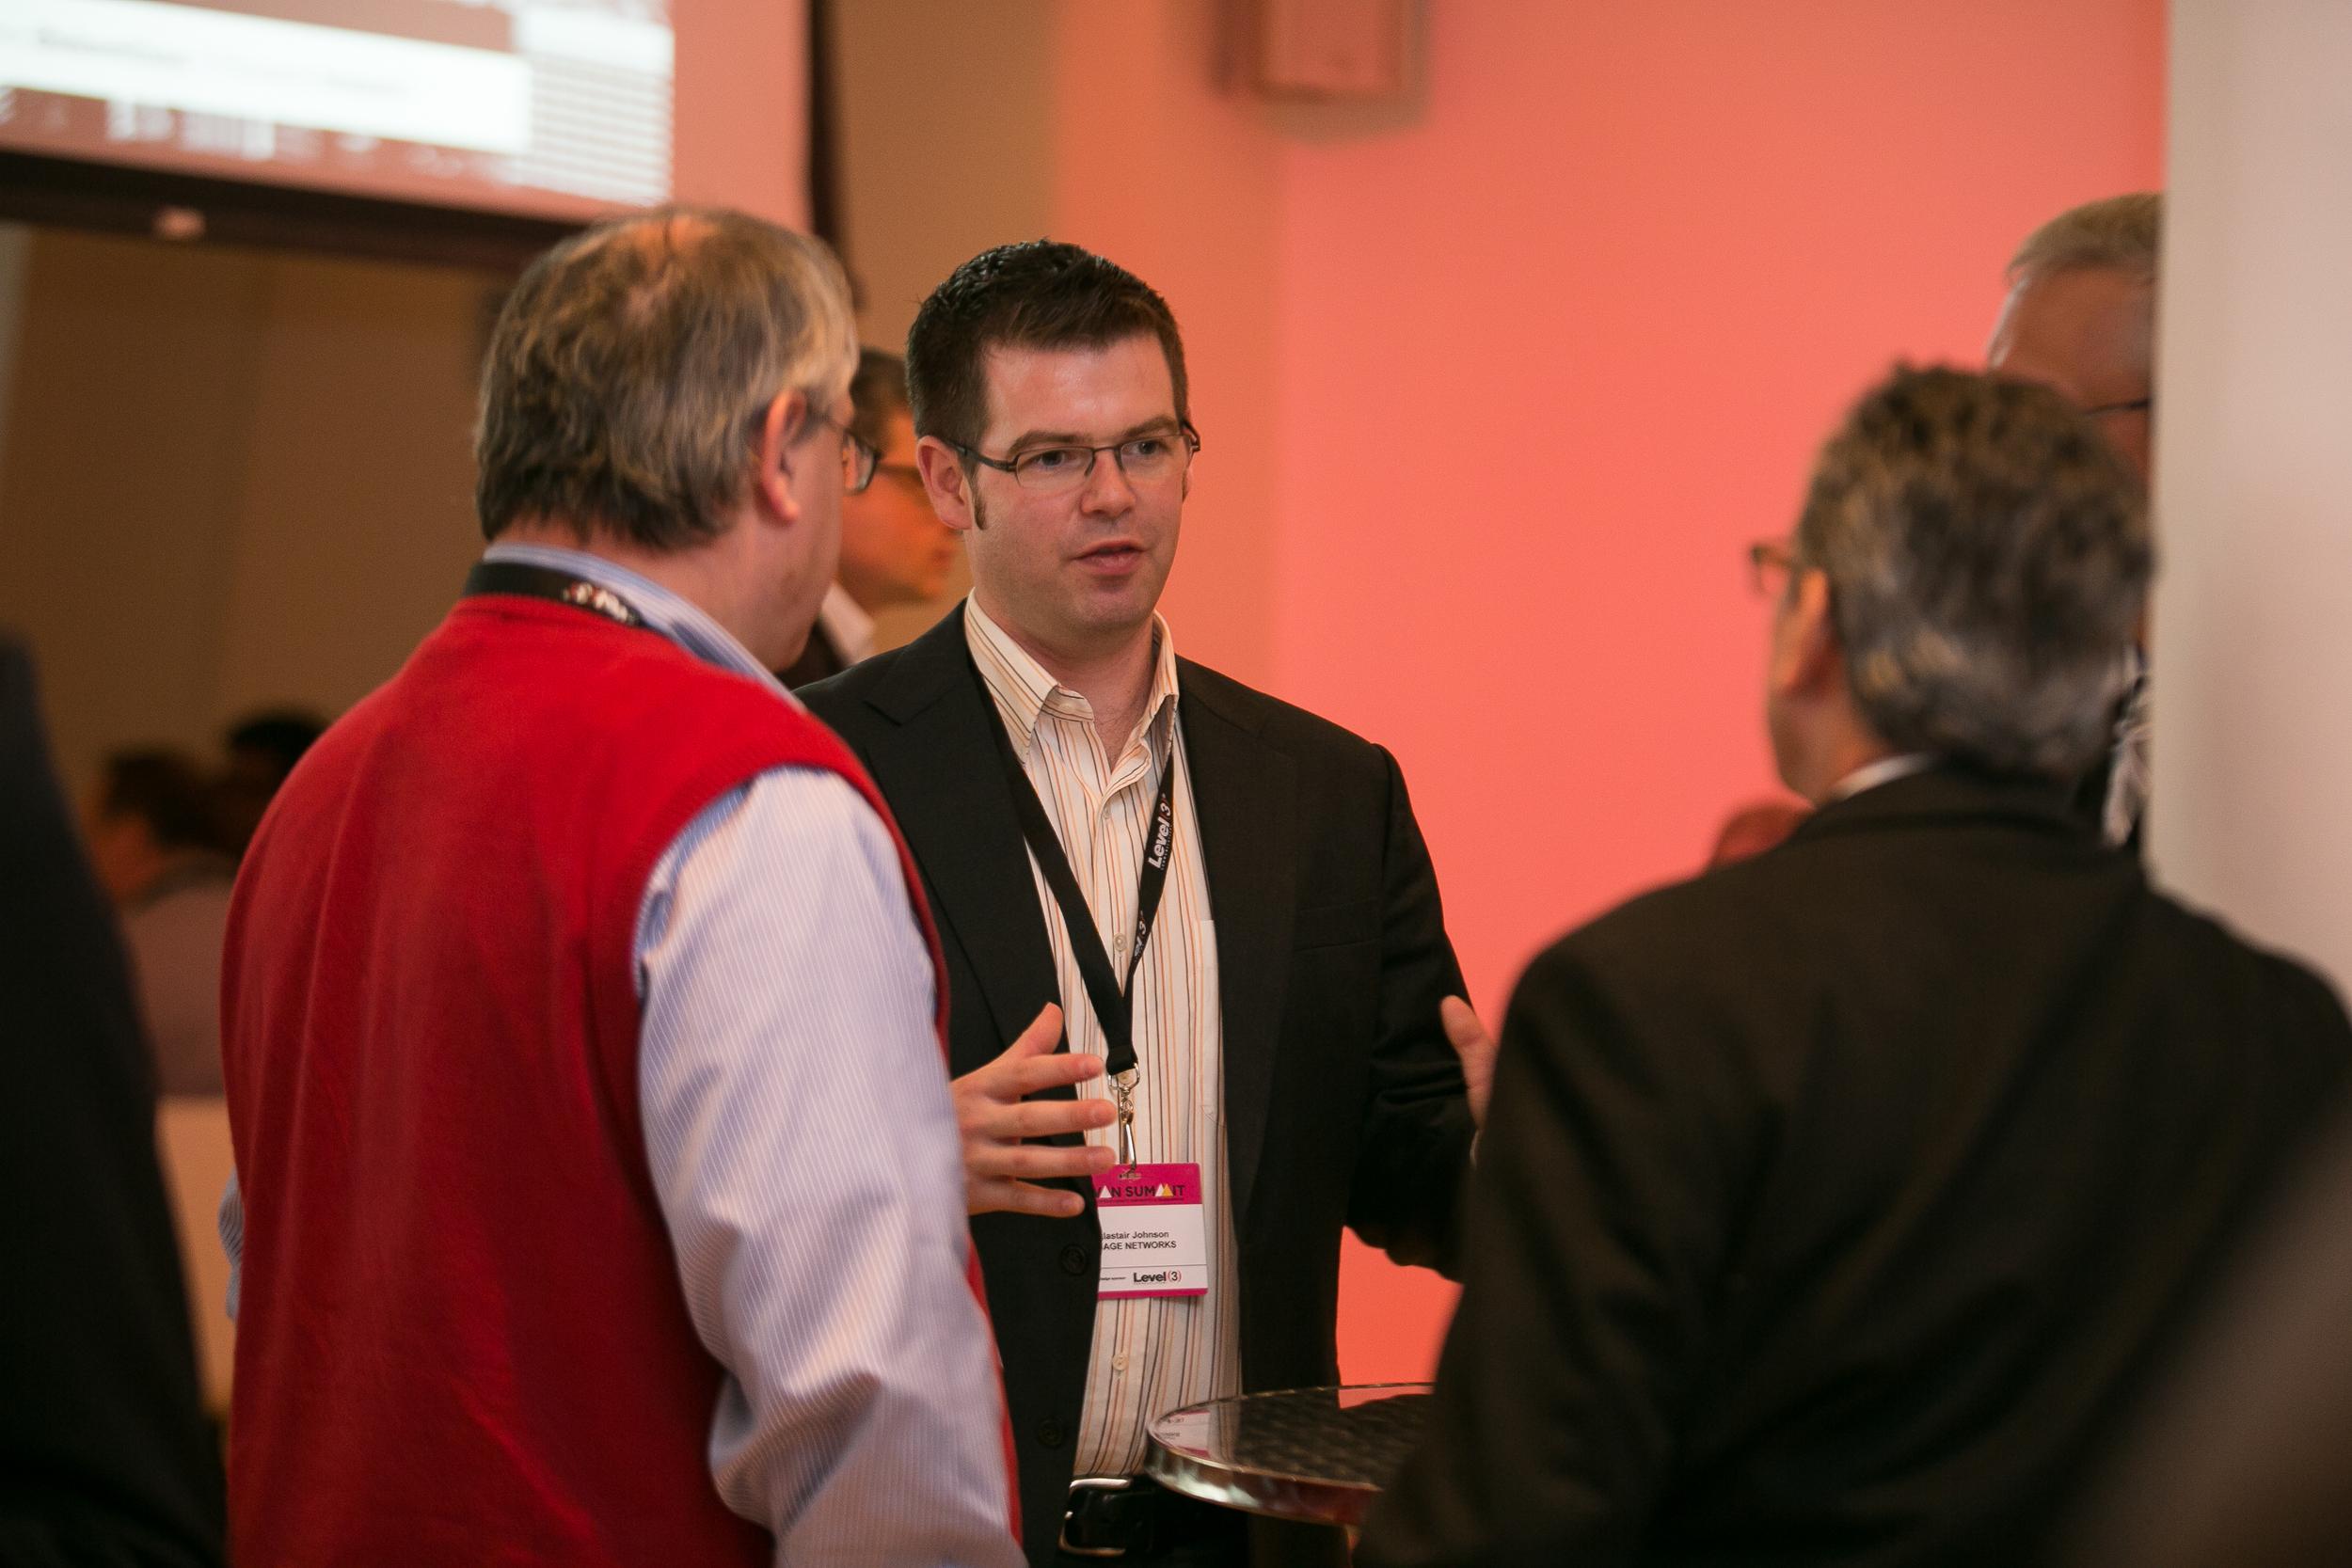 039-Capacity_Conferences-WAN_Summit-042715-6P9A0031.jpg